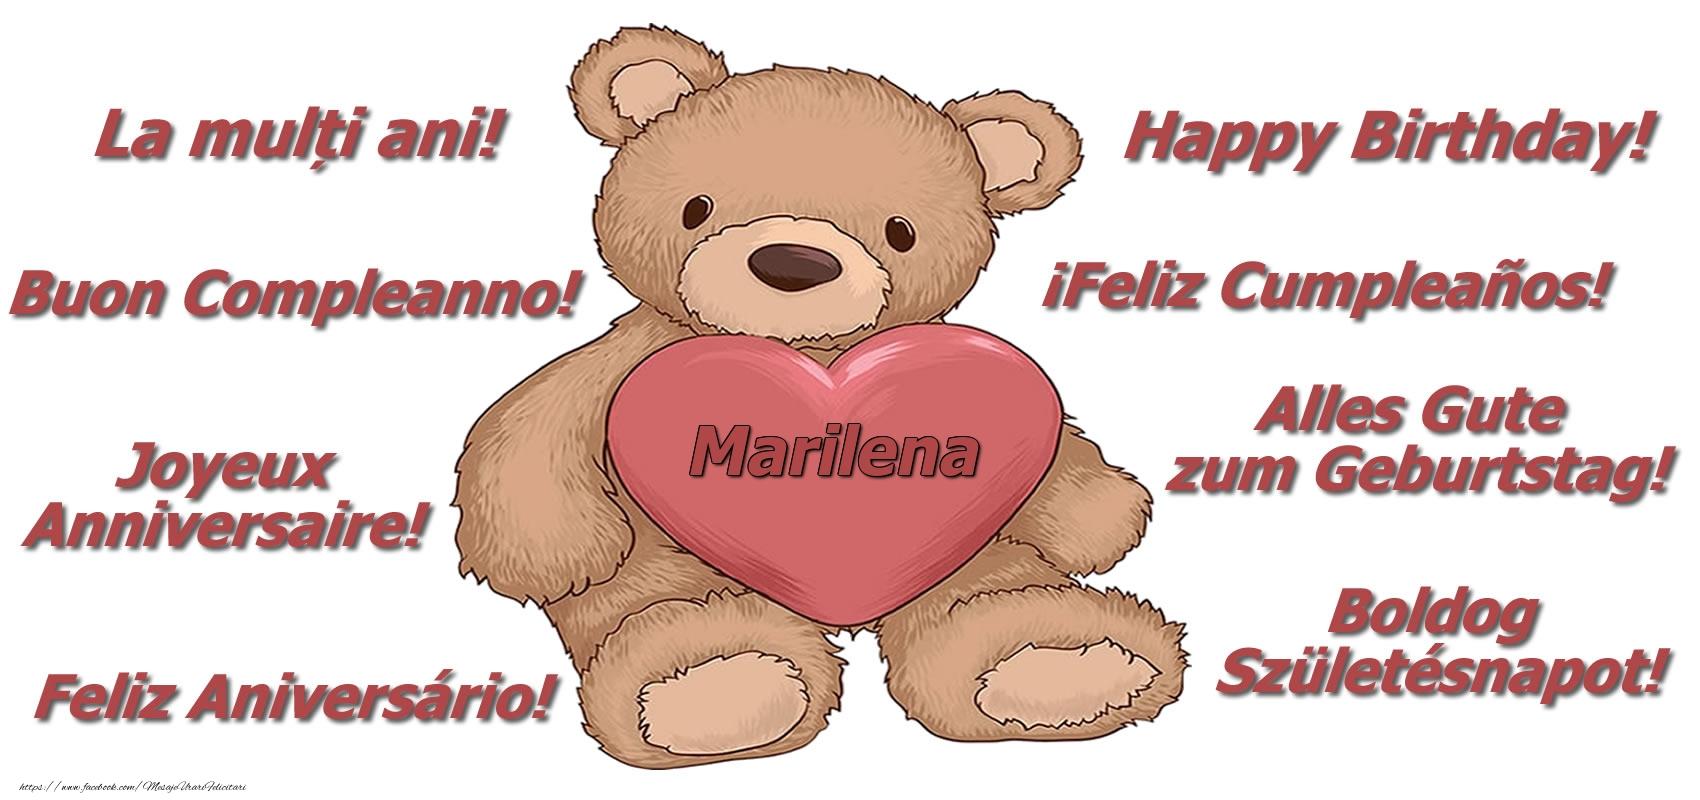 Felicitari de zi de nastere - La multi ani Marilena! - Ursulet